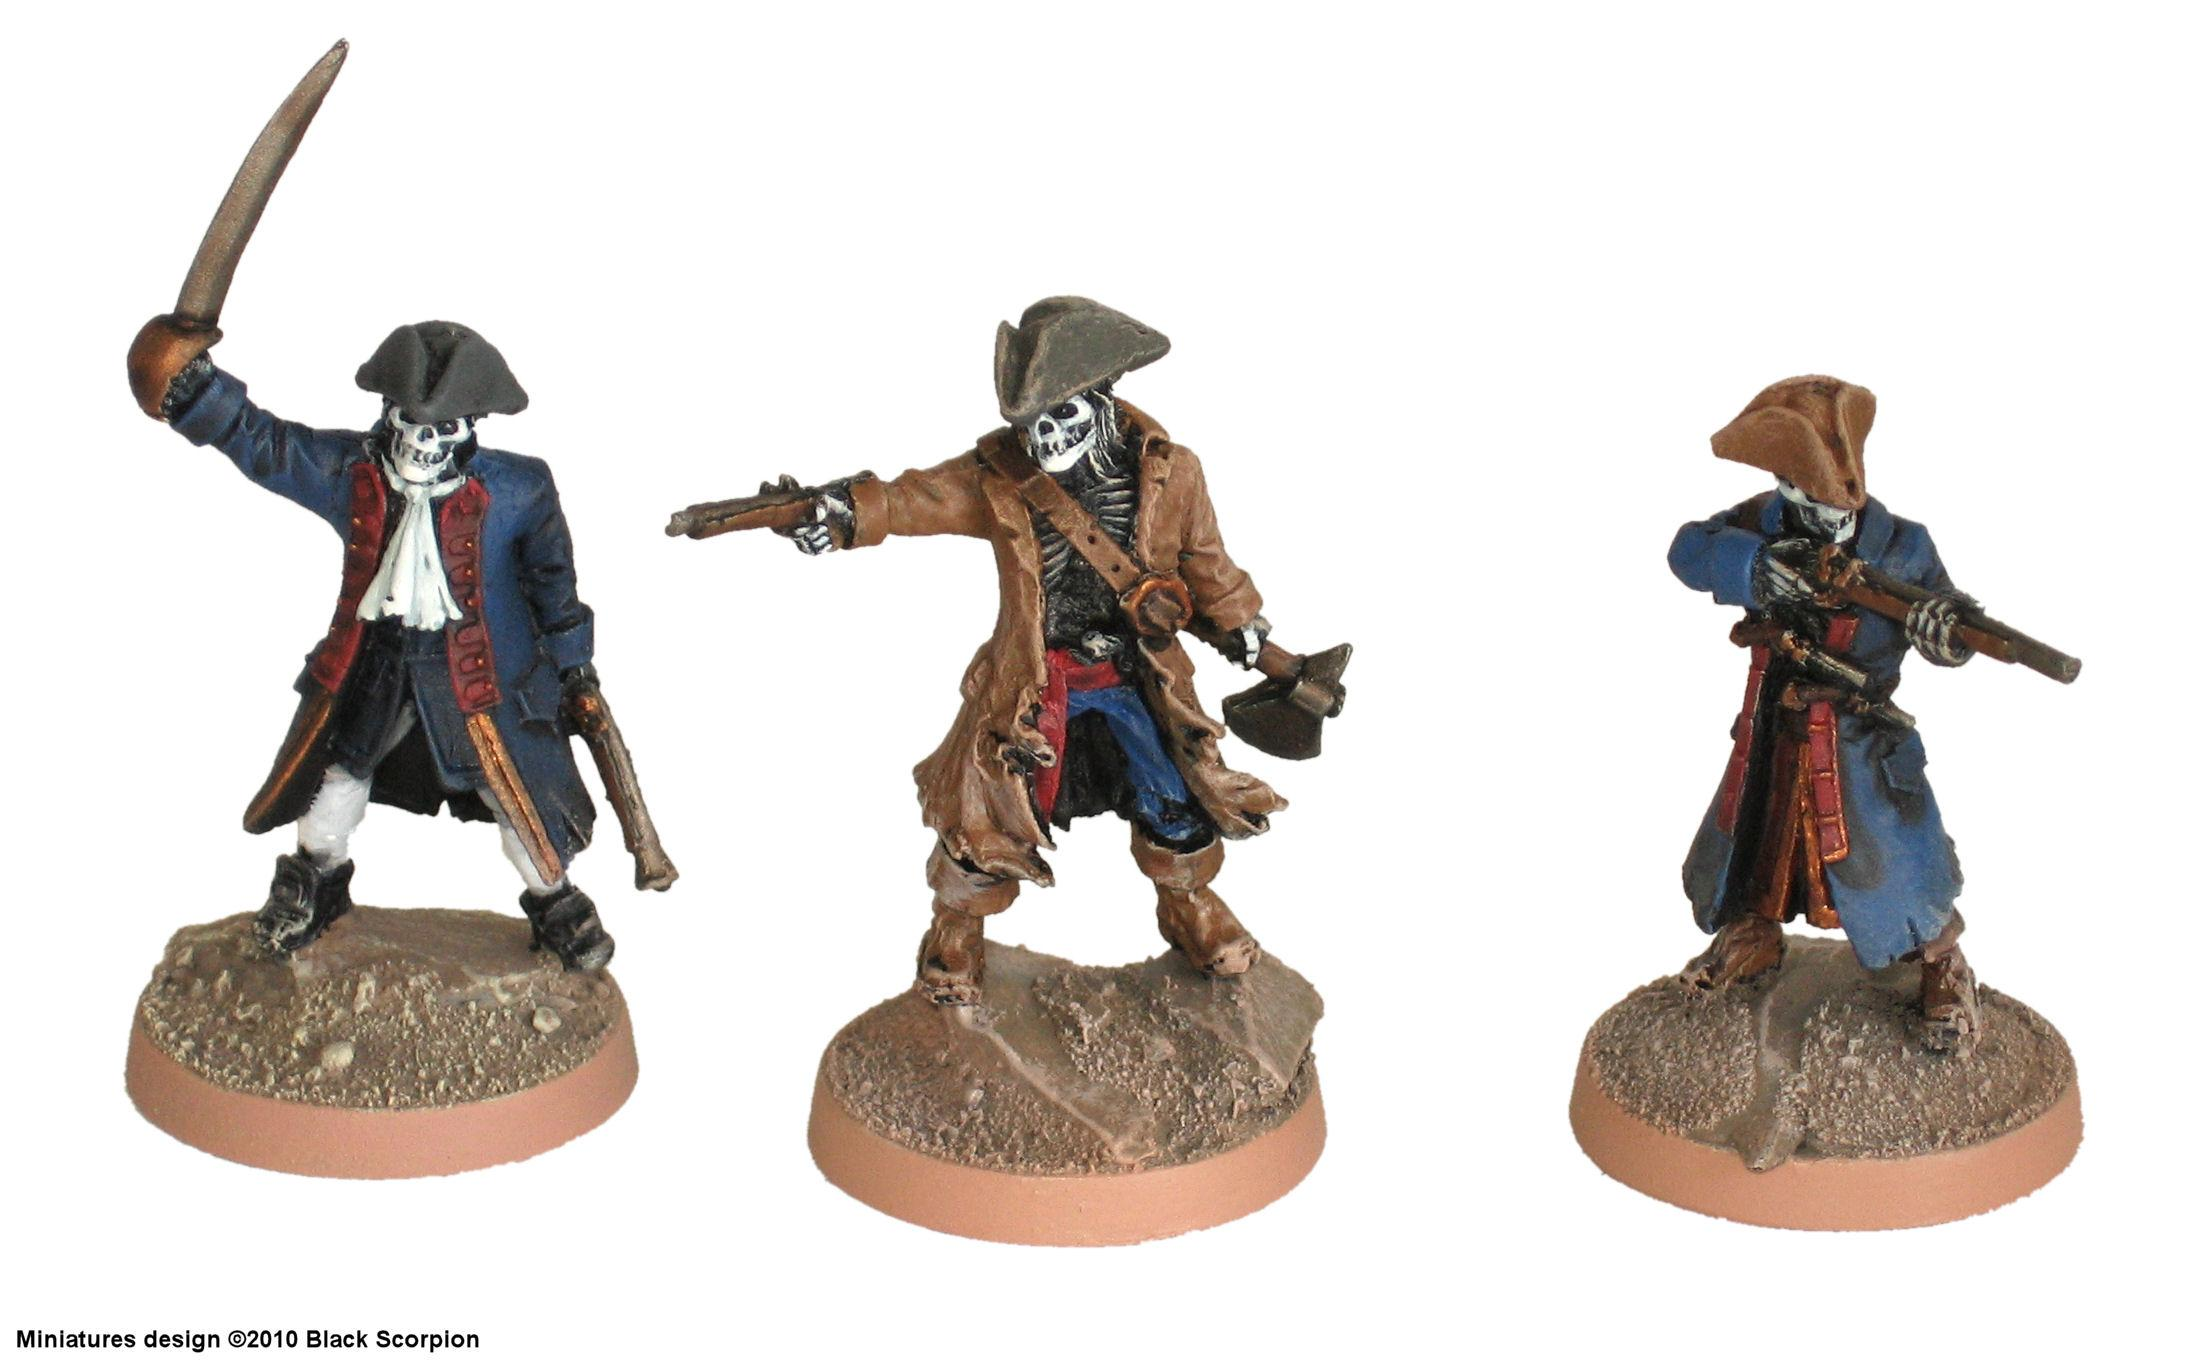 Black Scorpion, Bones, Cutlass, Naval, Pirate, Skeletons, Undead, Warhammer Fantasy